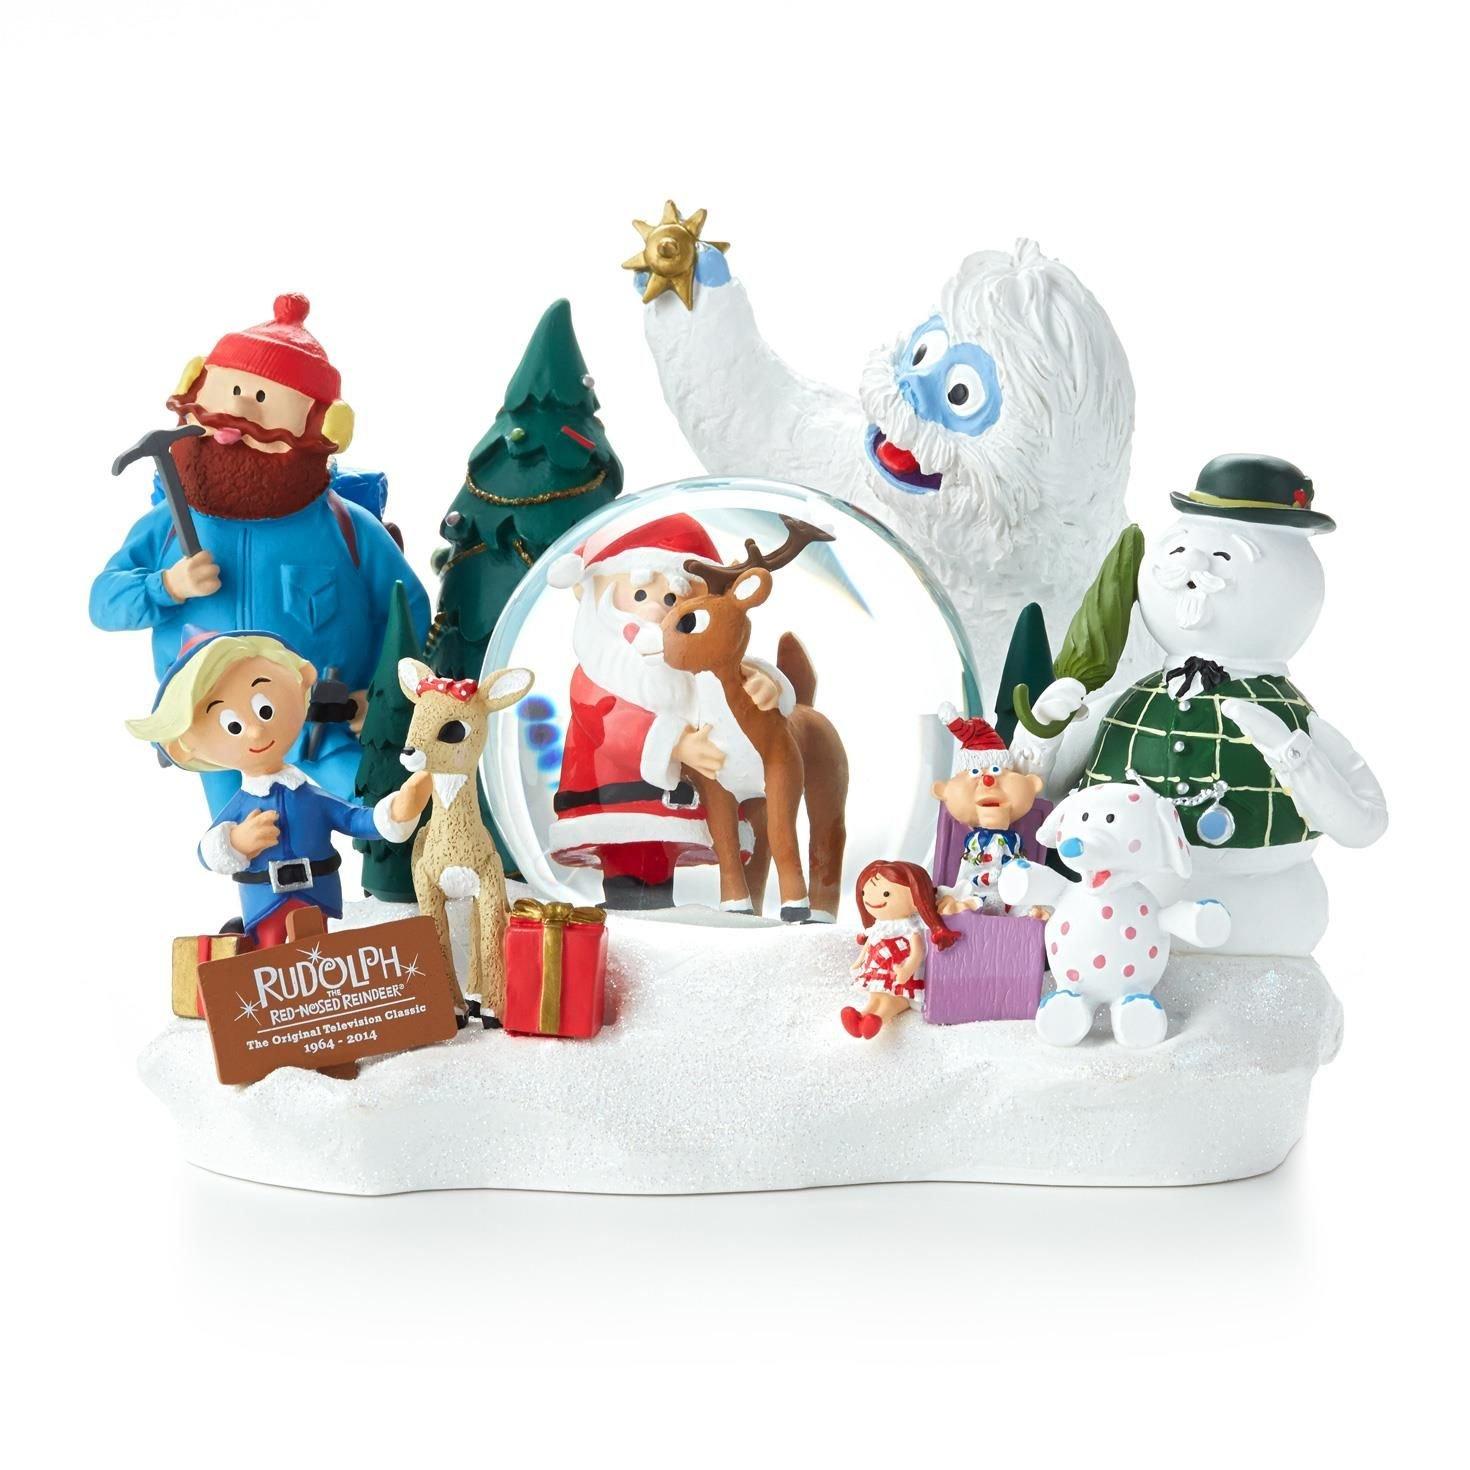 Amazon.com: Hallmark Christmas XKT1445 Rudolph the Red-Nosed ...